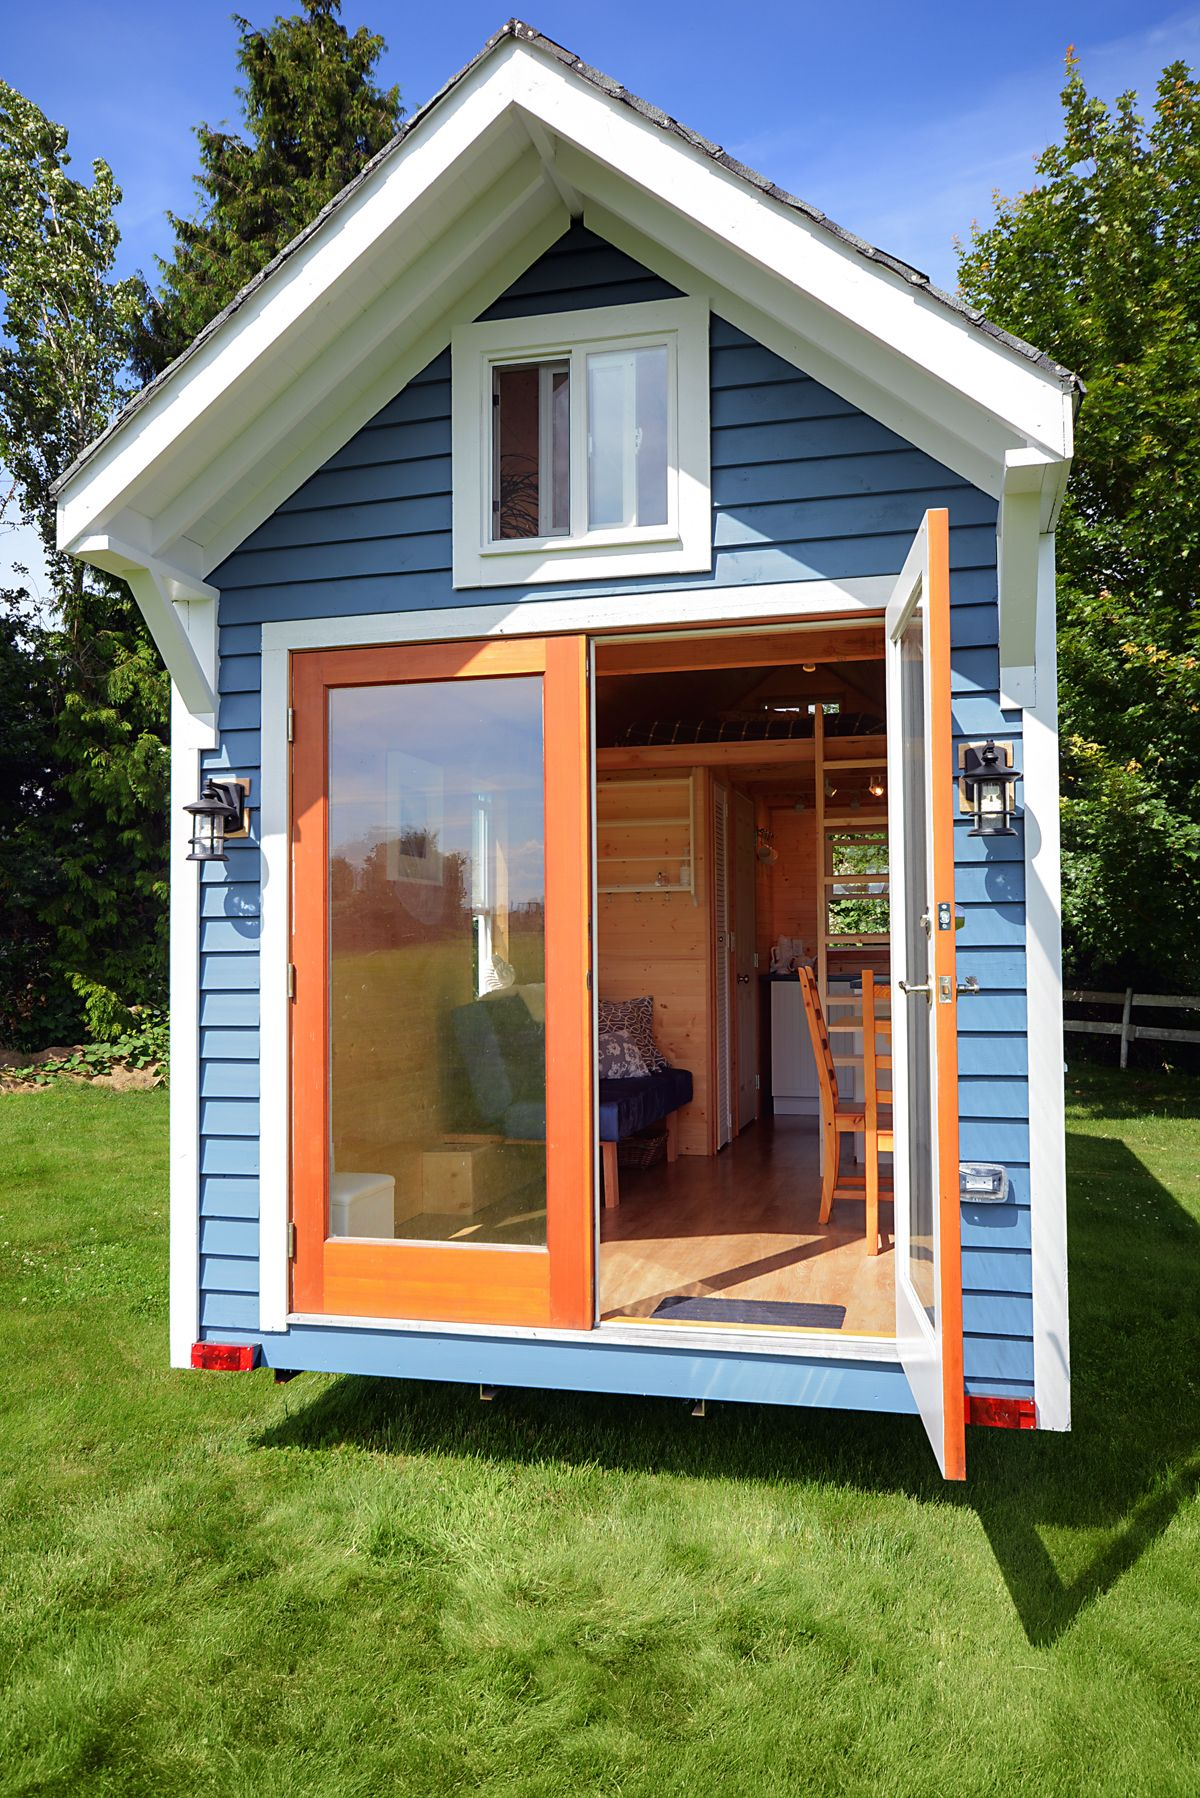 French Doors On Tiny House